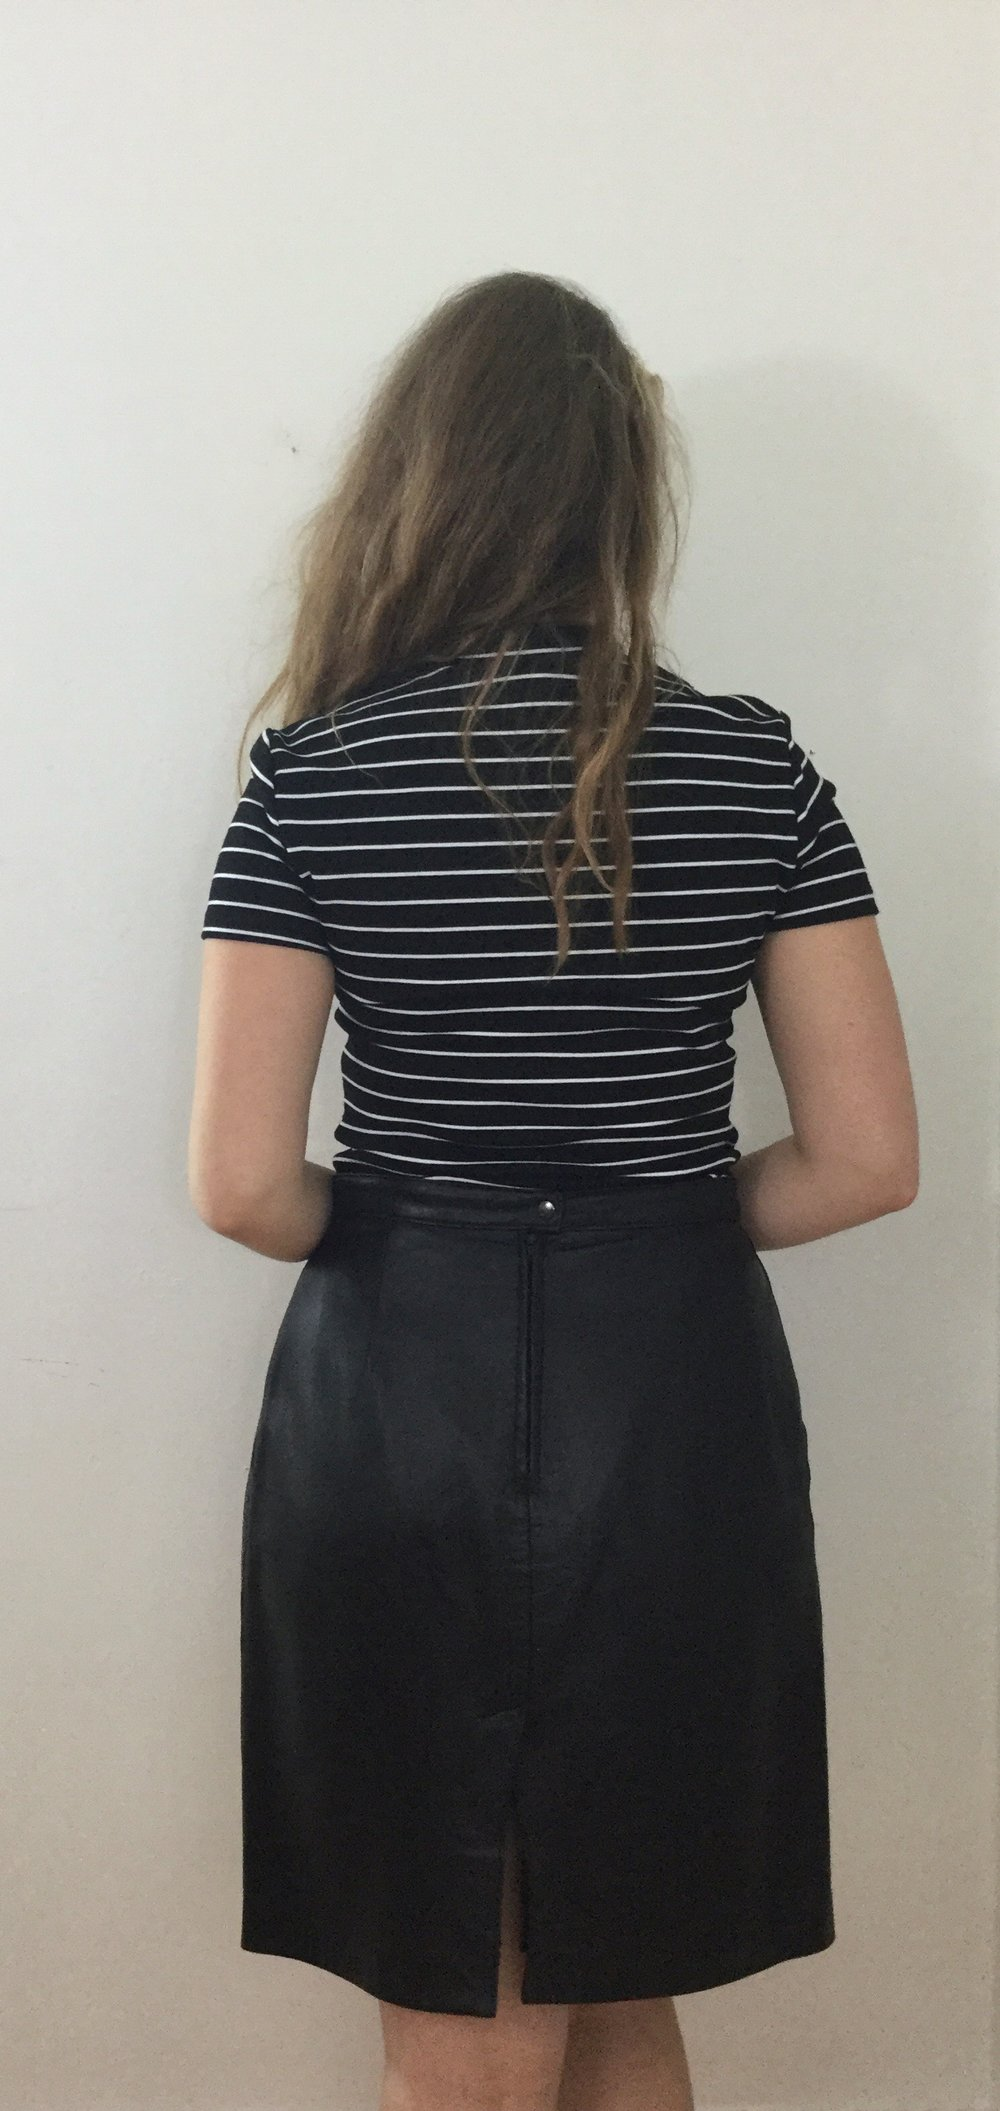 American Apparel Turtleneck Dress